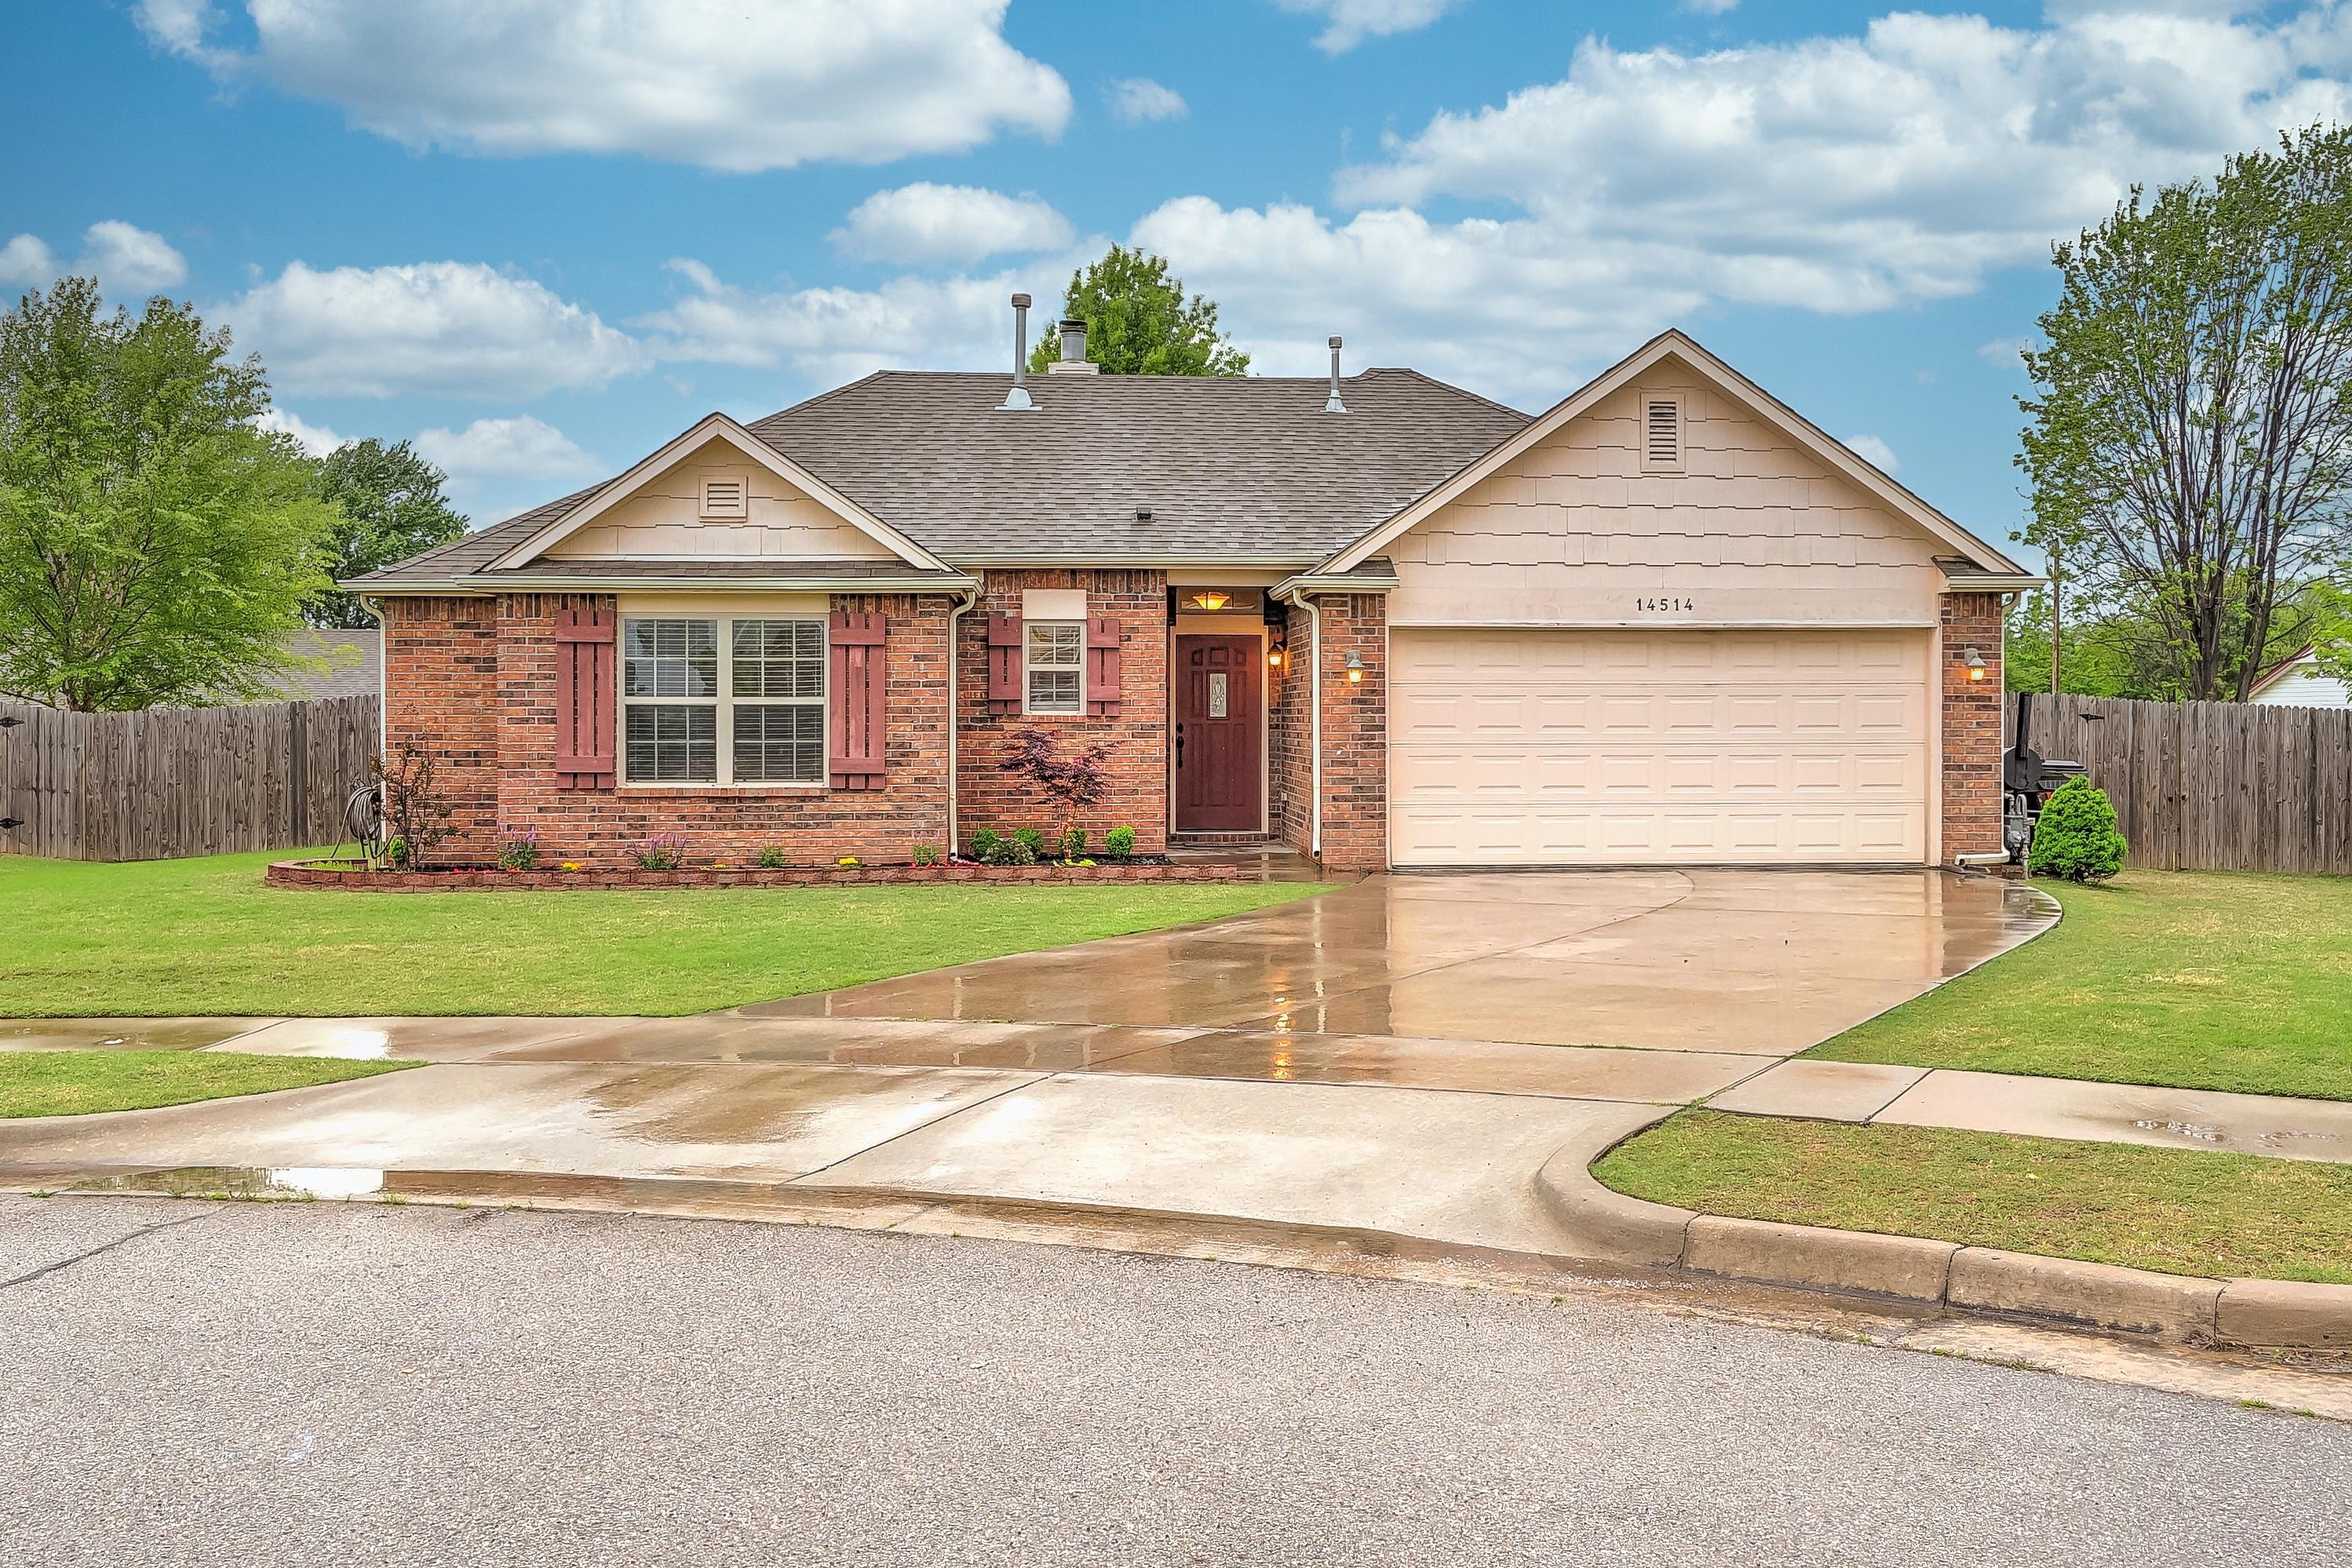 14514 S Oak Street Property Photo